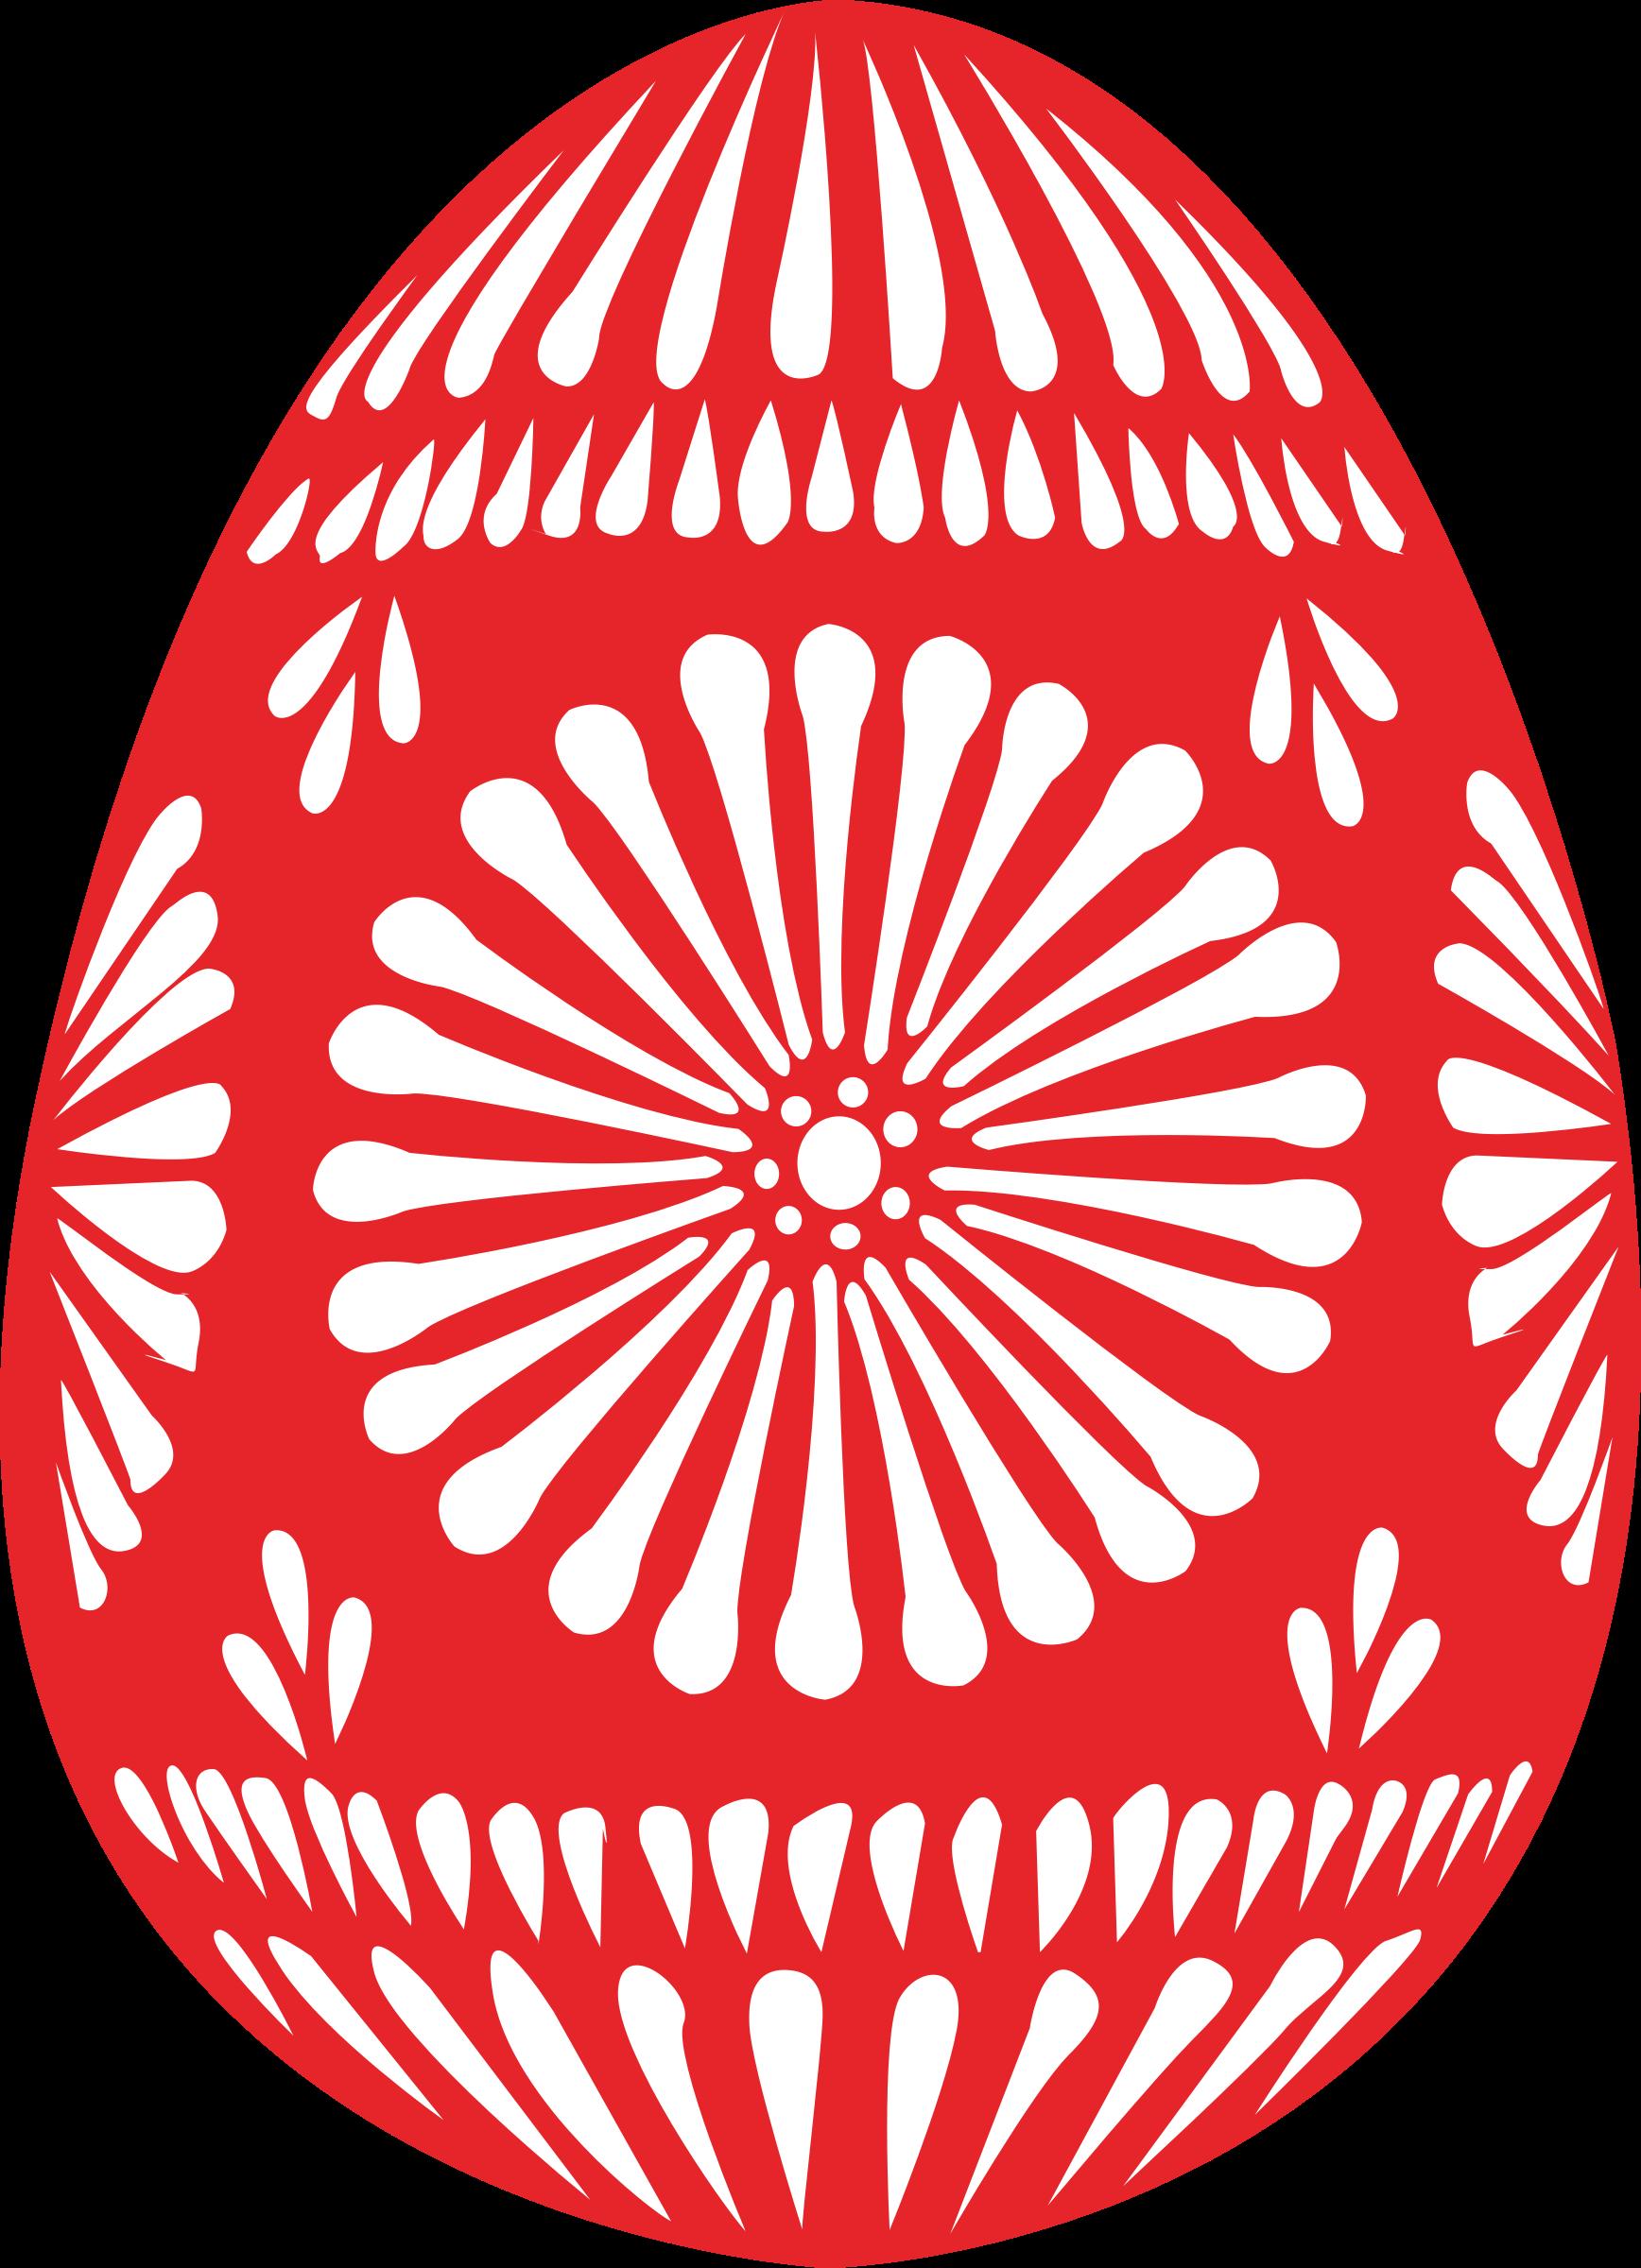 Egg clipart single. Easter big image png